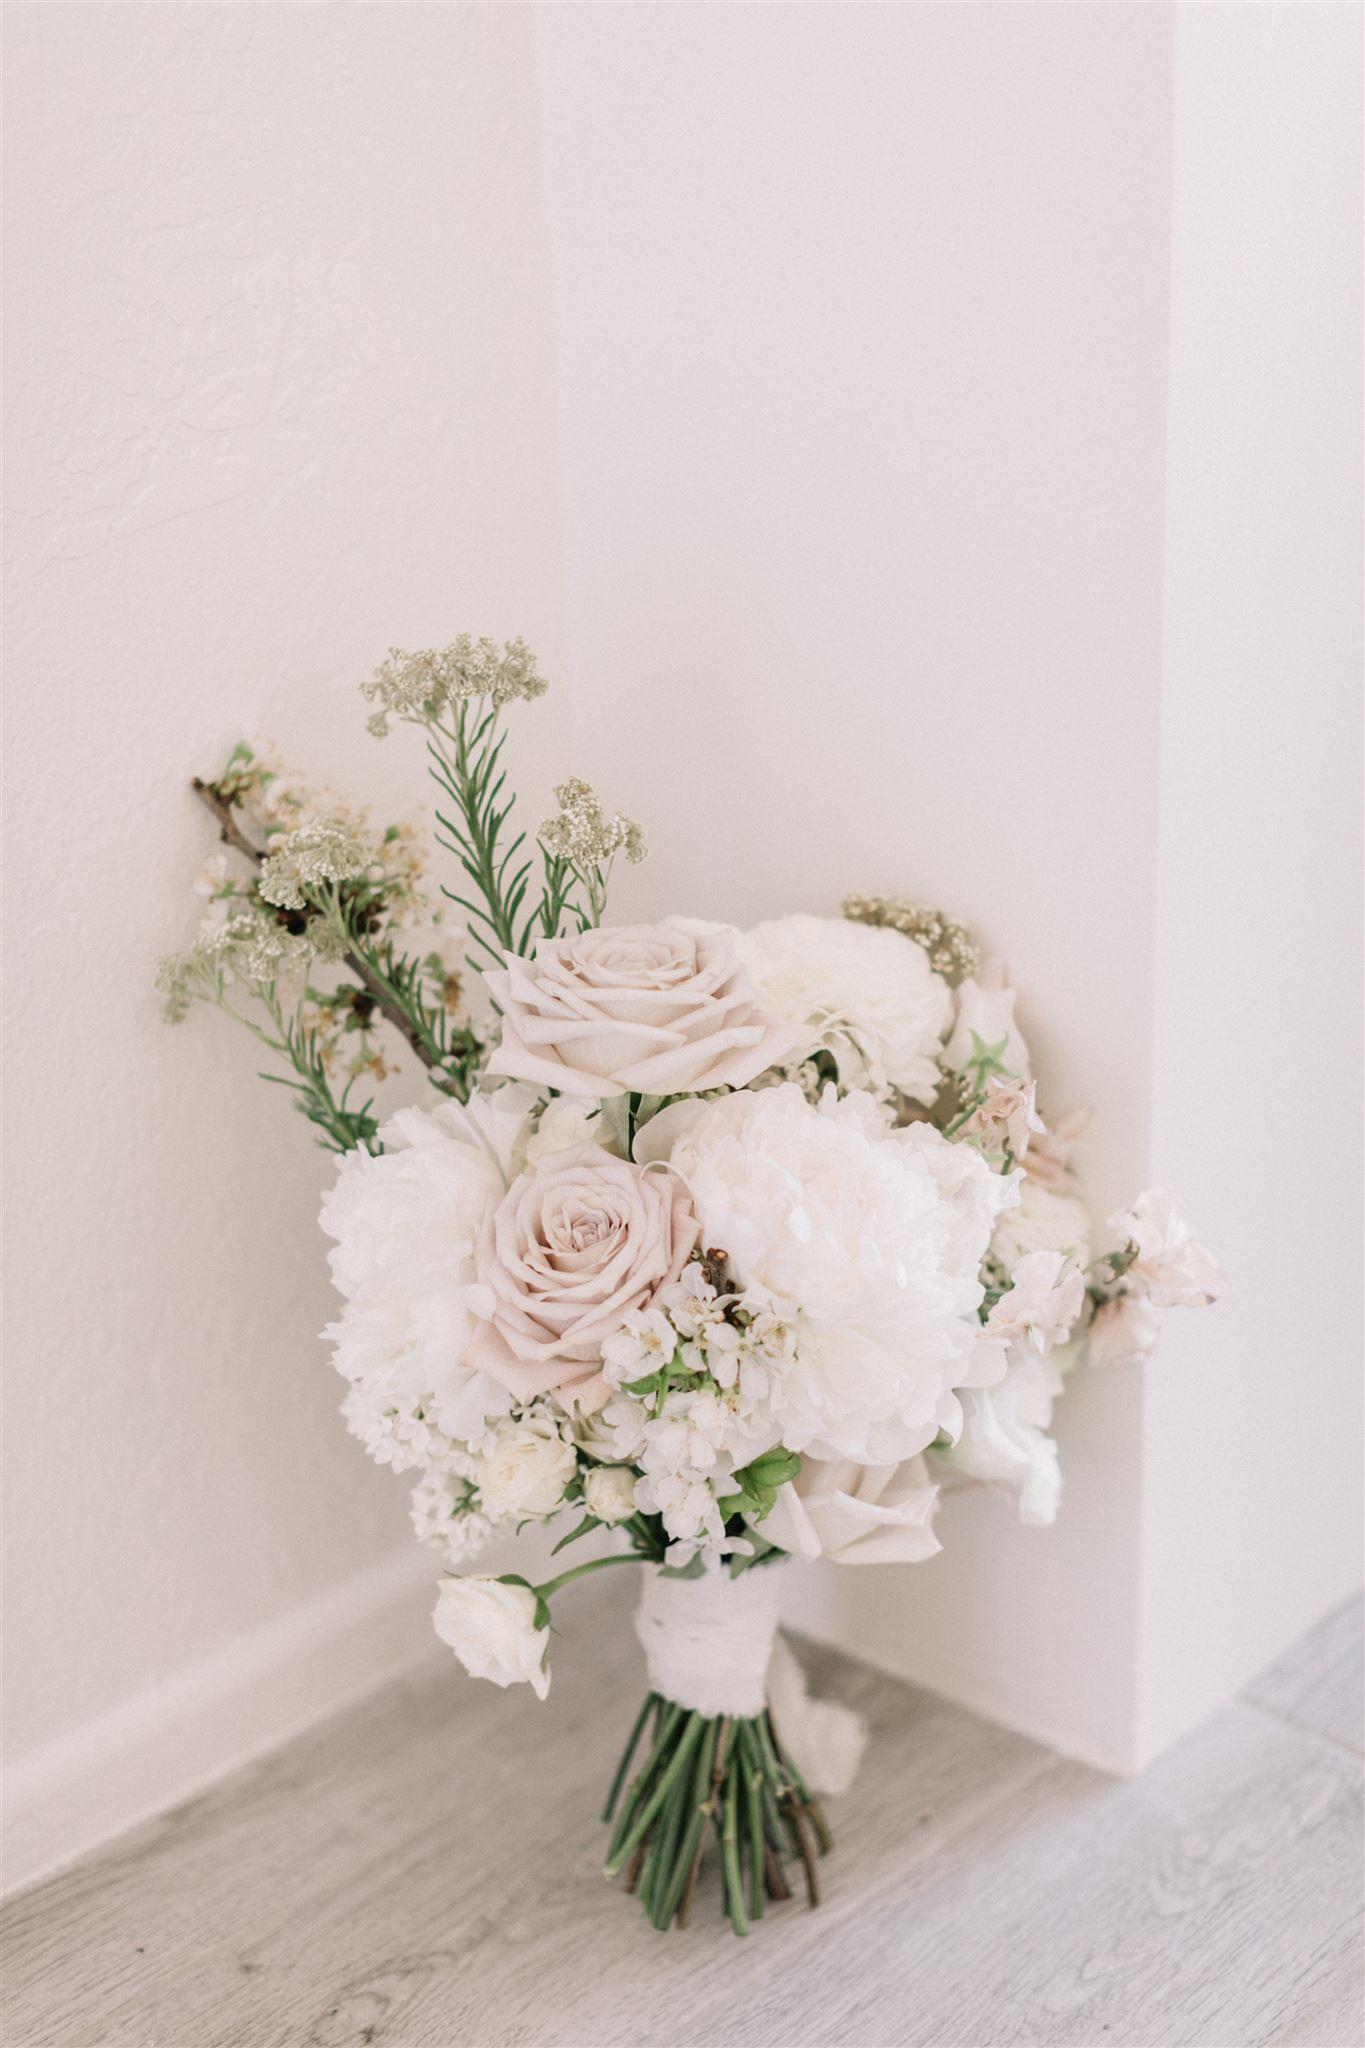 caitlin-alohilani-photography-floraltique-165_websize.jpg